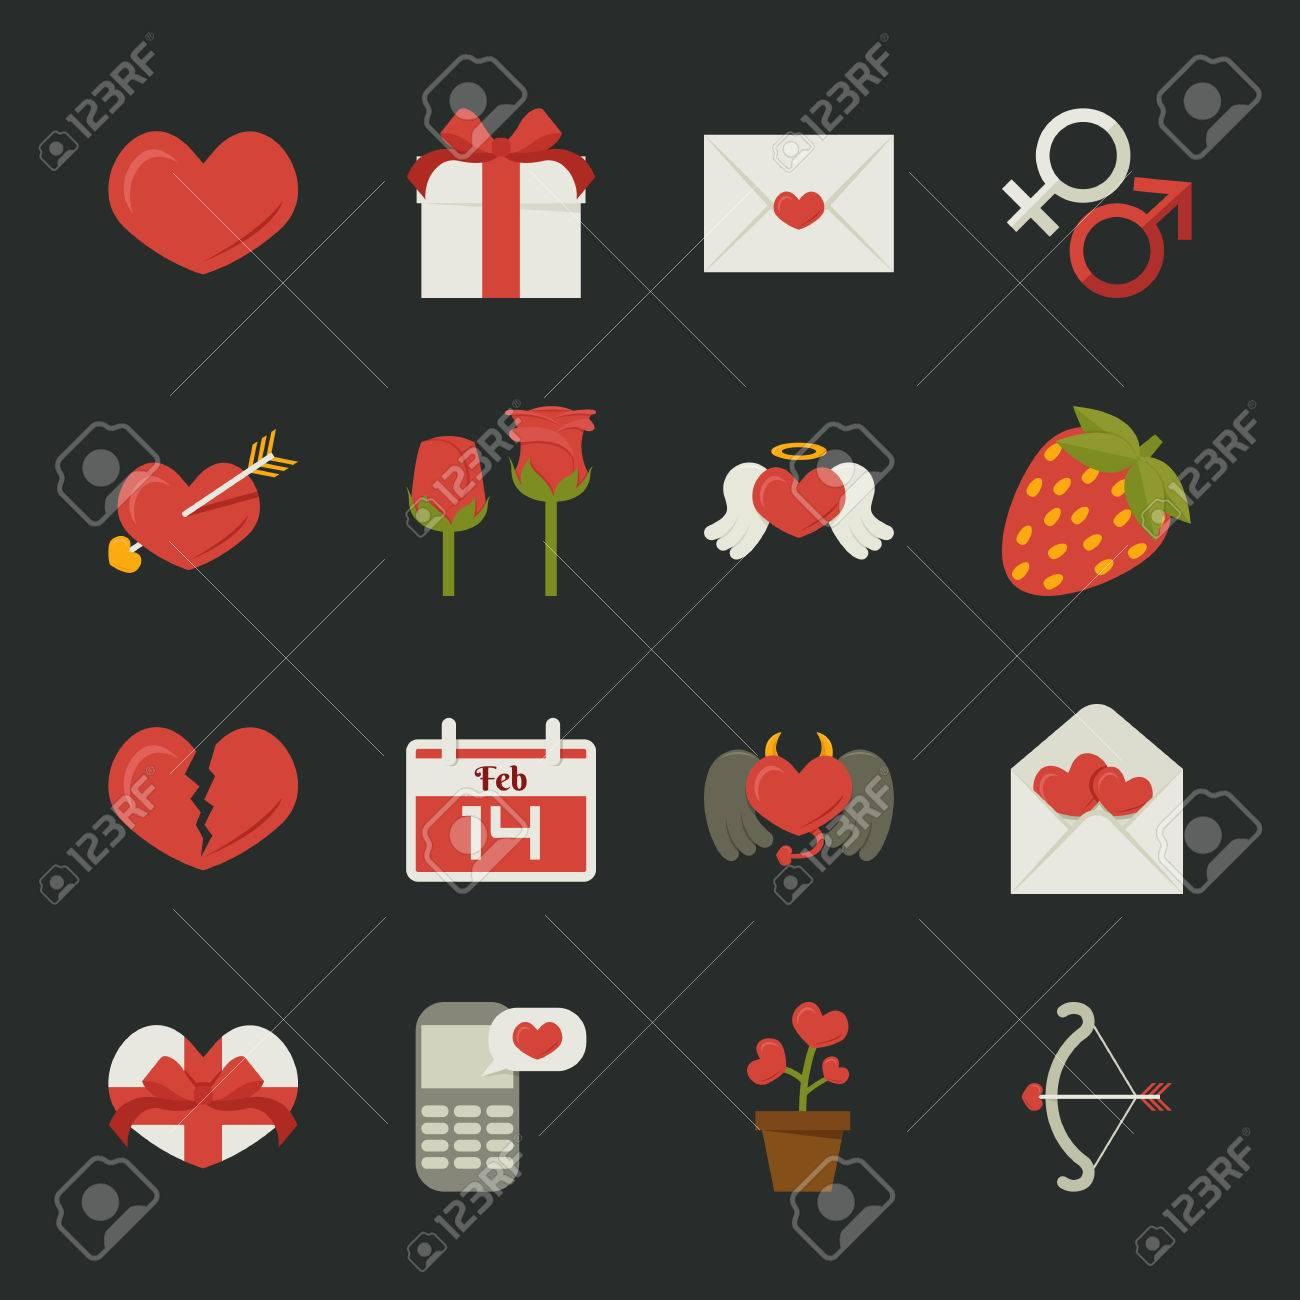 Valentine's day icons, love symbols  , flat design , eps10 vector format Stock Vector - 25517355